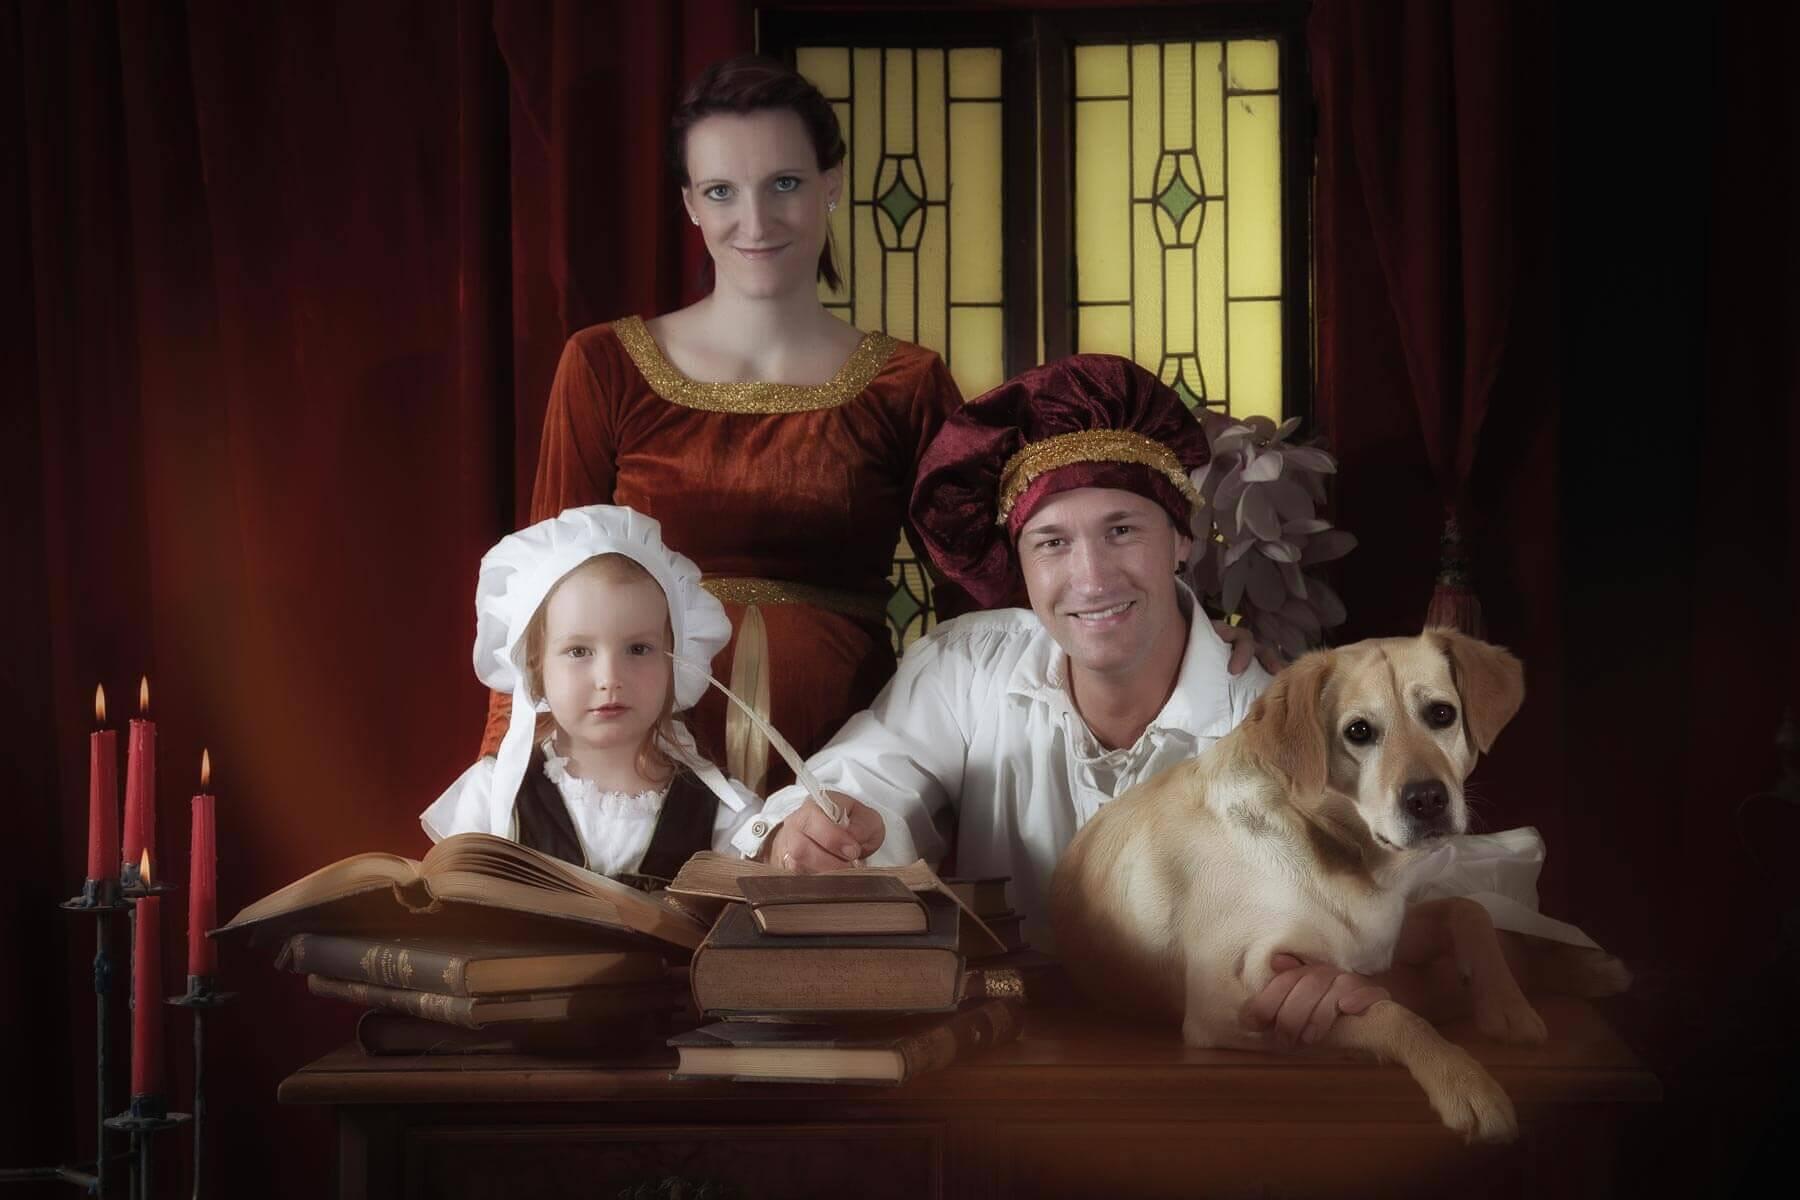 Fotograf-Fotostudio-Dresden-Mittelalter-Shooting-Geschichte-Epoche-Familie-Tiere-Bücher-Schmuck-Frisur-Styling-Gewand